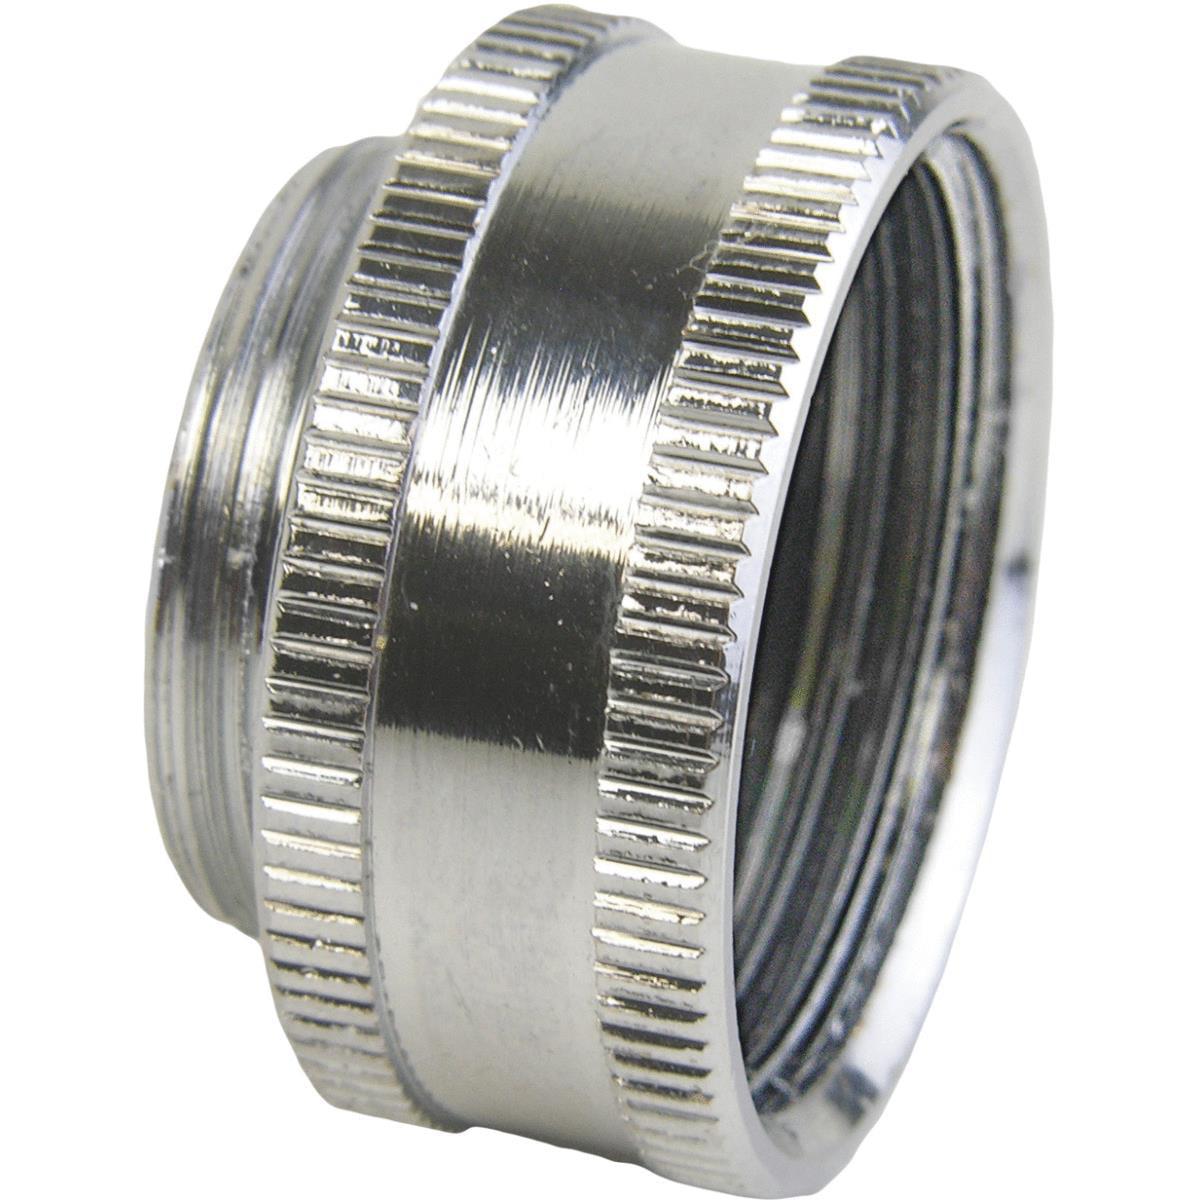 Lasco Dual Thread Faucet Aerator Adapter